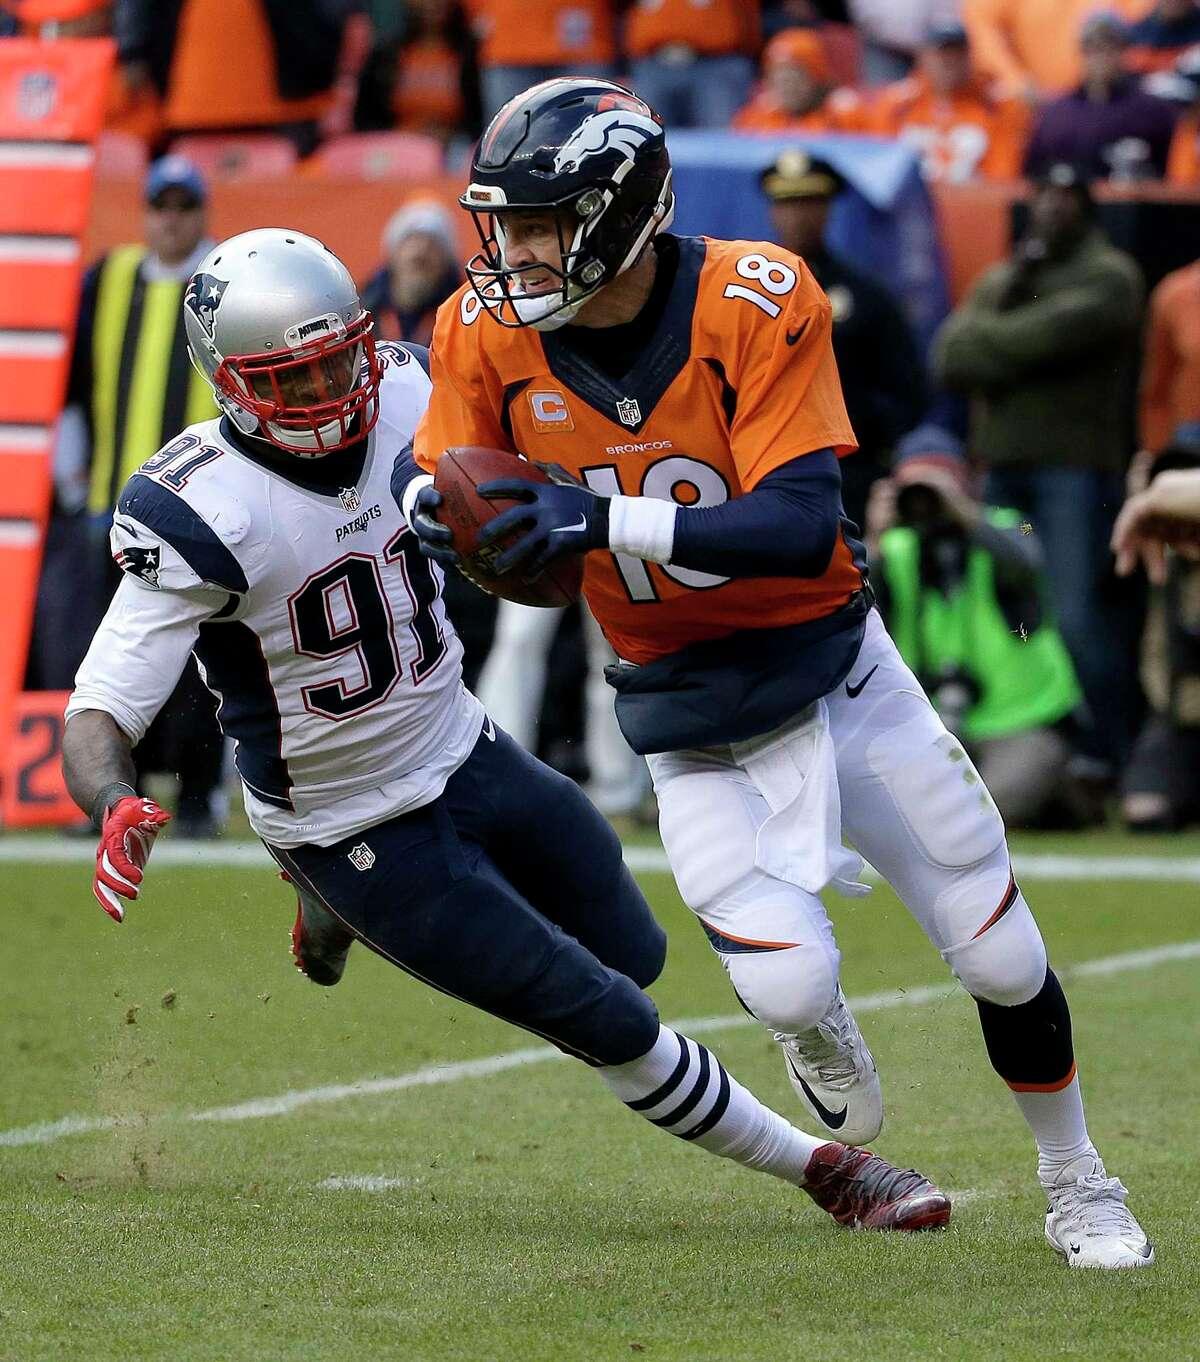 Broncos quarterback Peyton Manning evades a tackle by Patriots linebacker Jamie Collins.